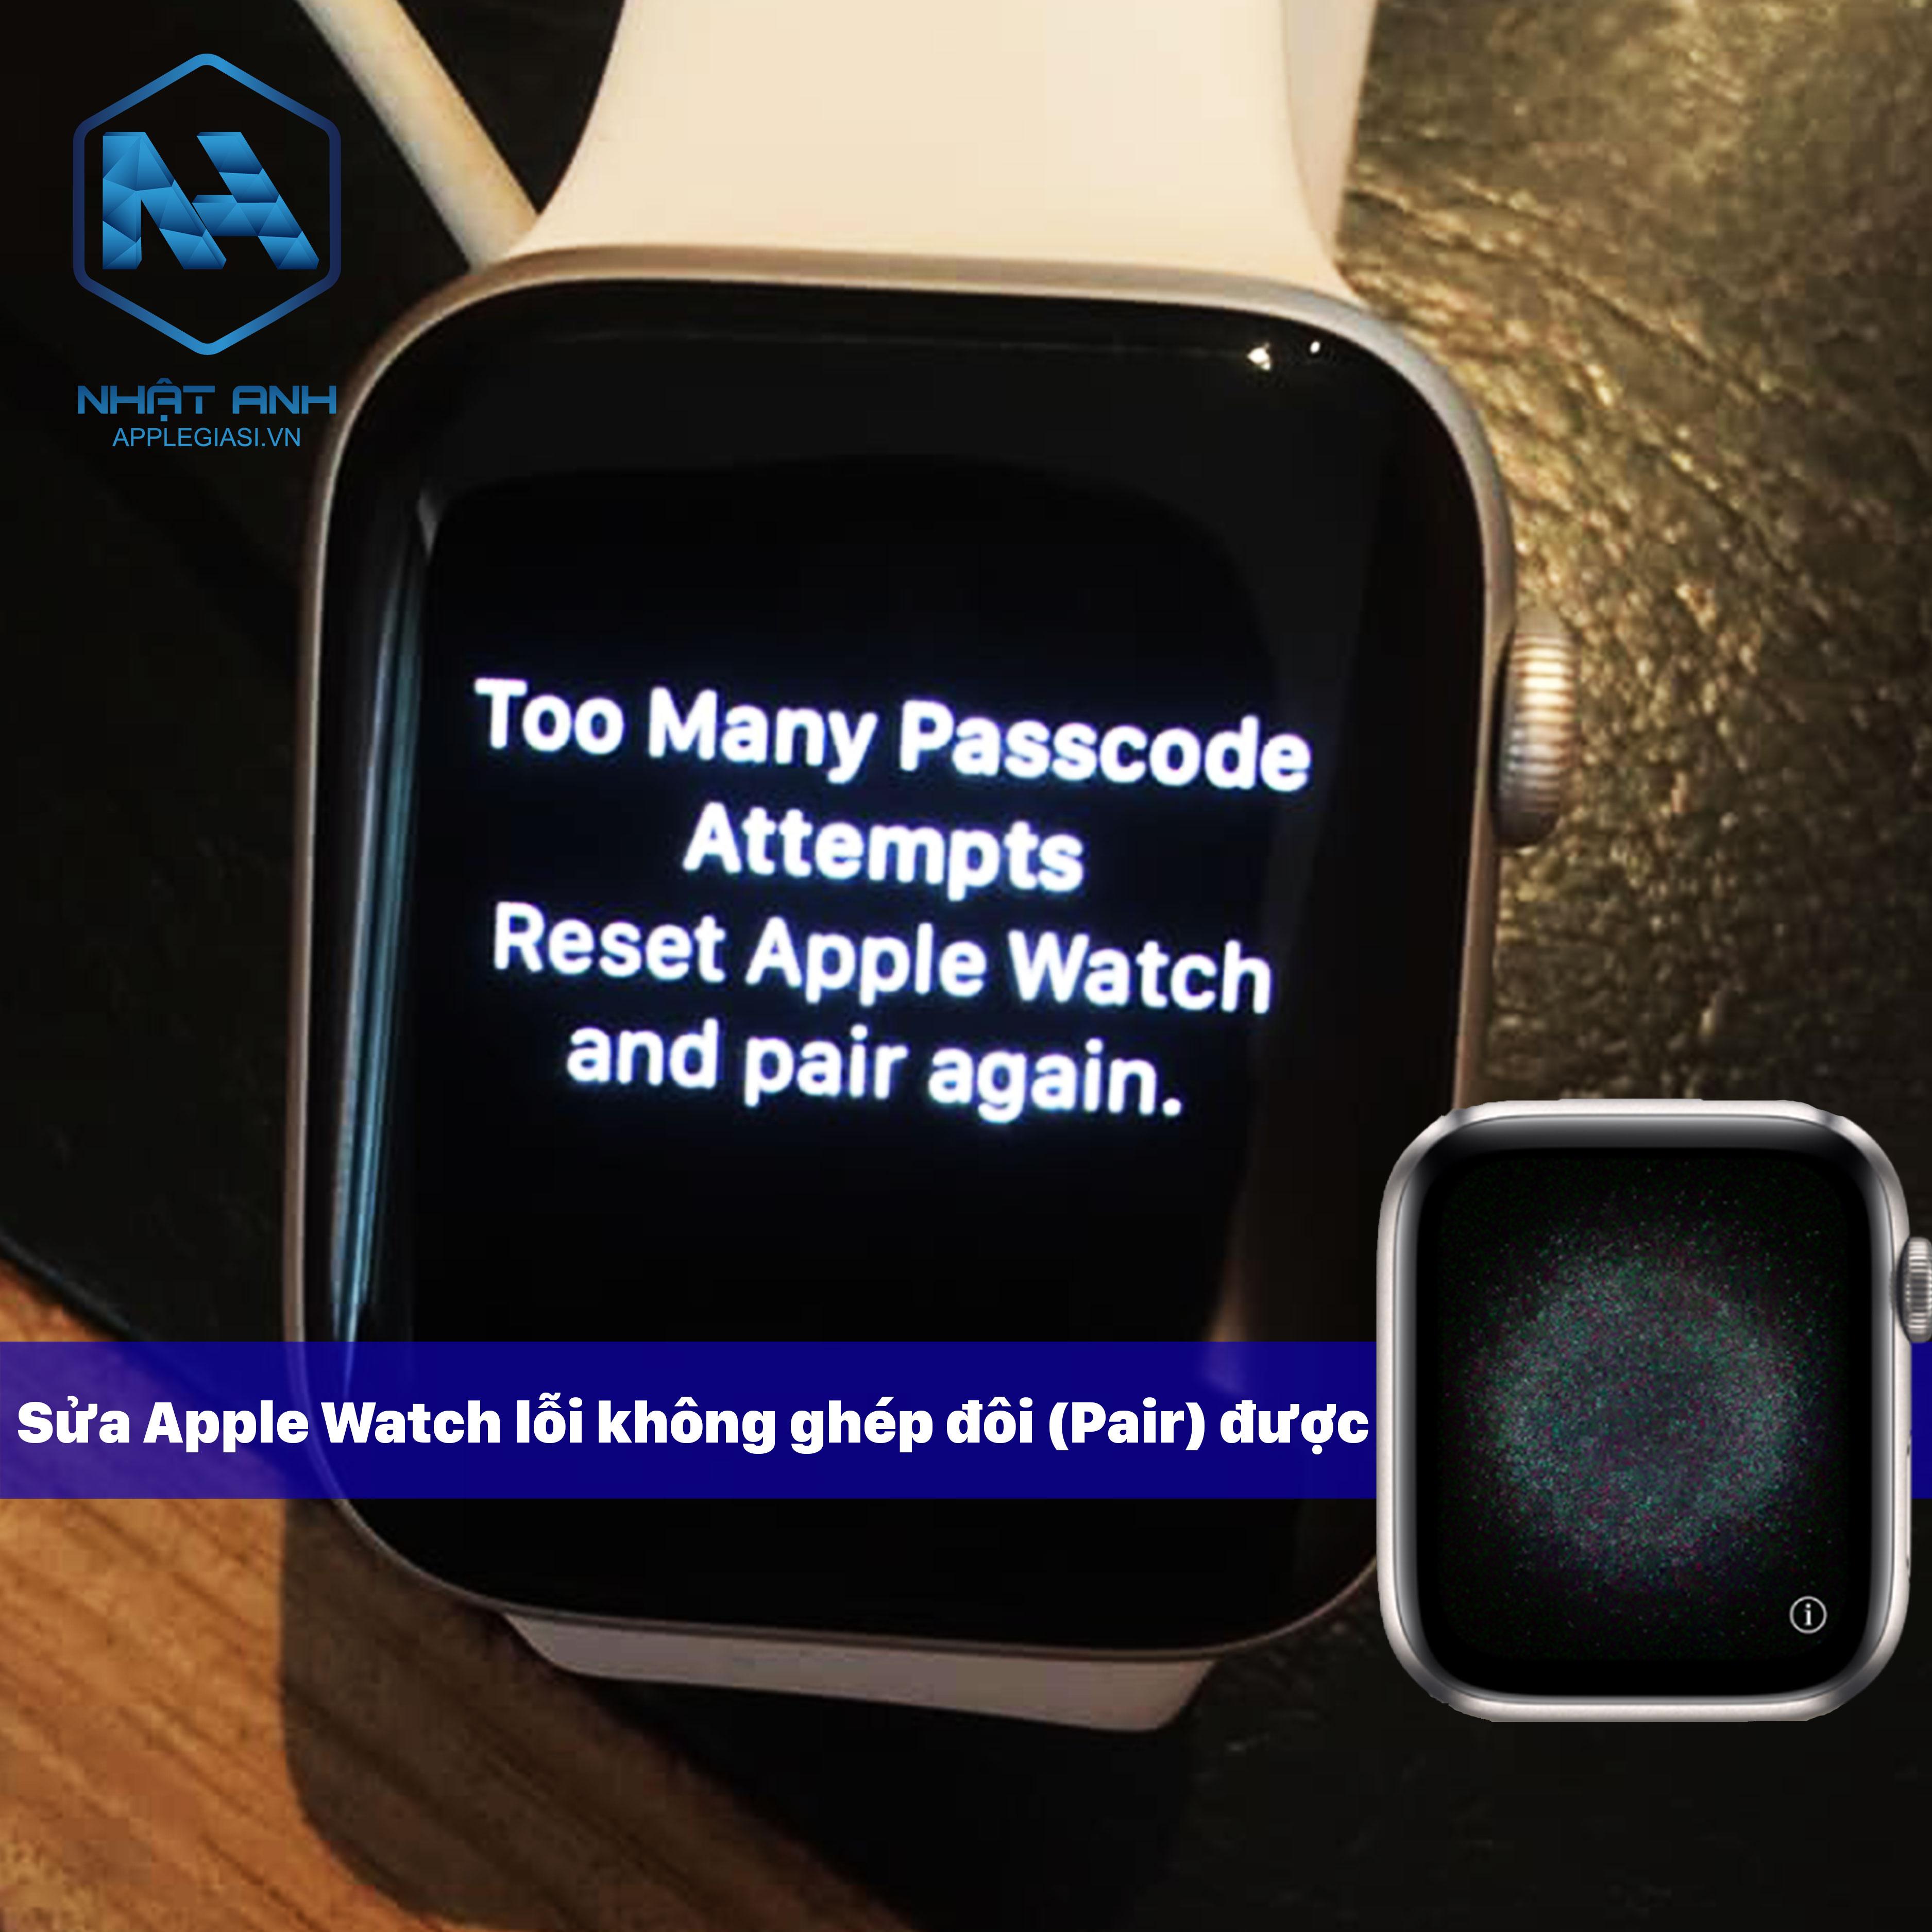 apple watch lỗi chấm than